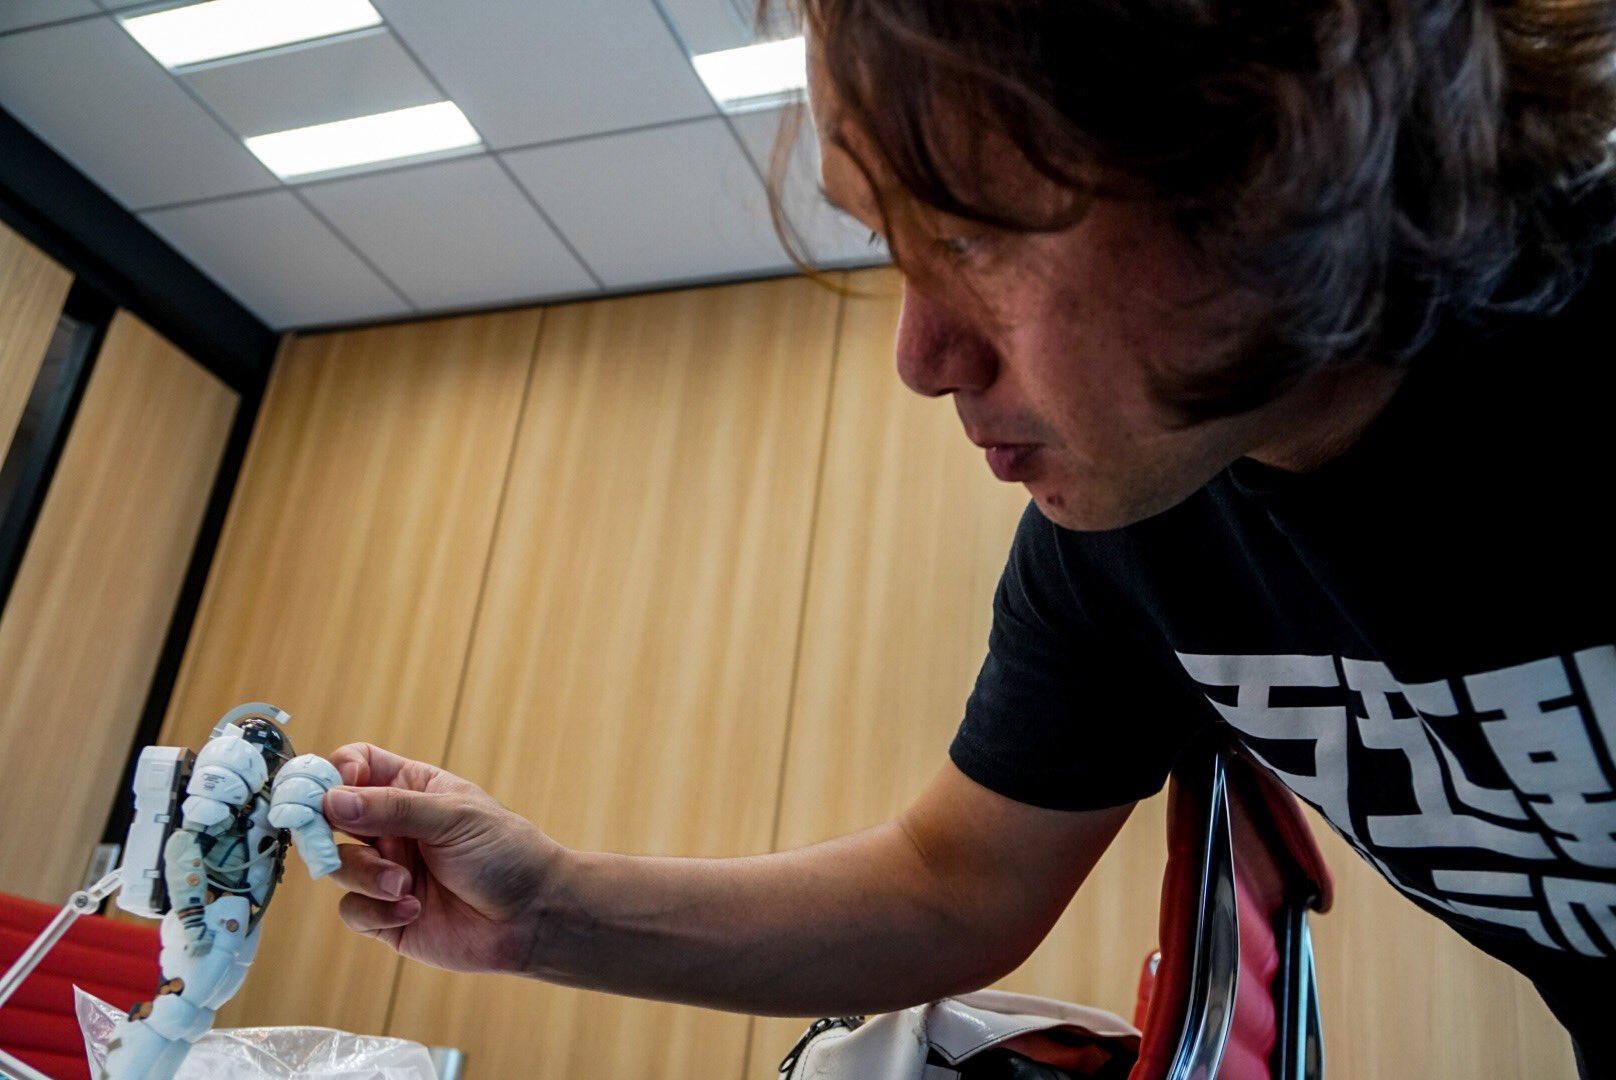 Yoji Shinkawa inspectant la figurine Figma de Ludens, le 25 mai 2017